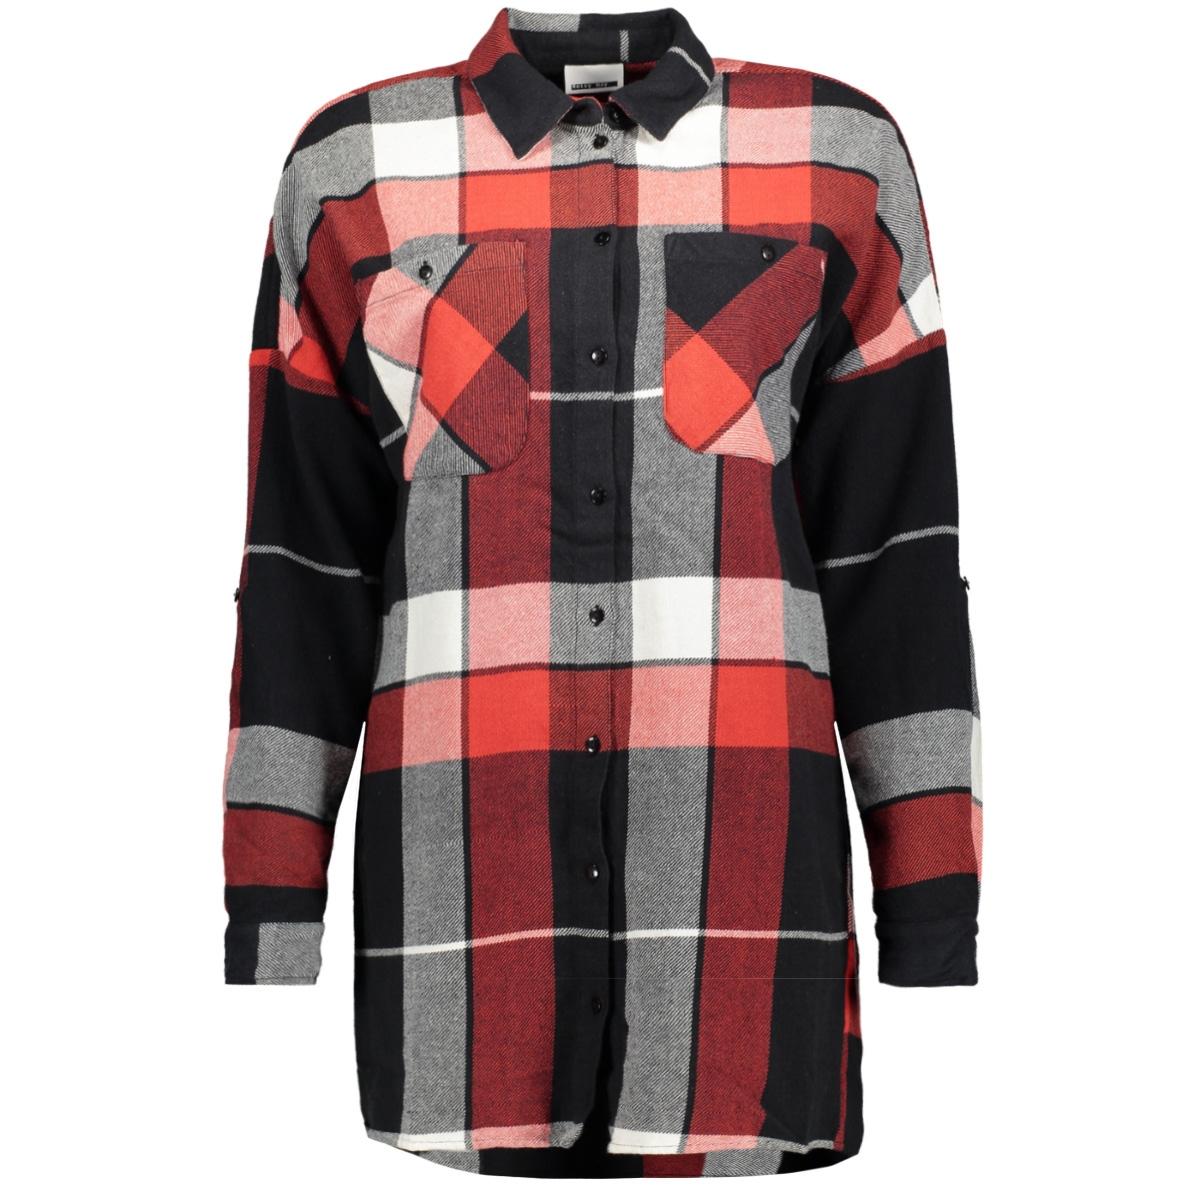 nmerik l/s oversize shirt 17-8 27000692 noisy may blouse flame scarlet/ combo